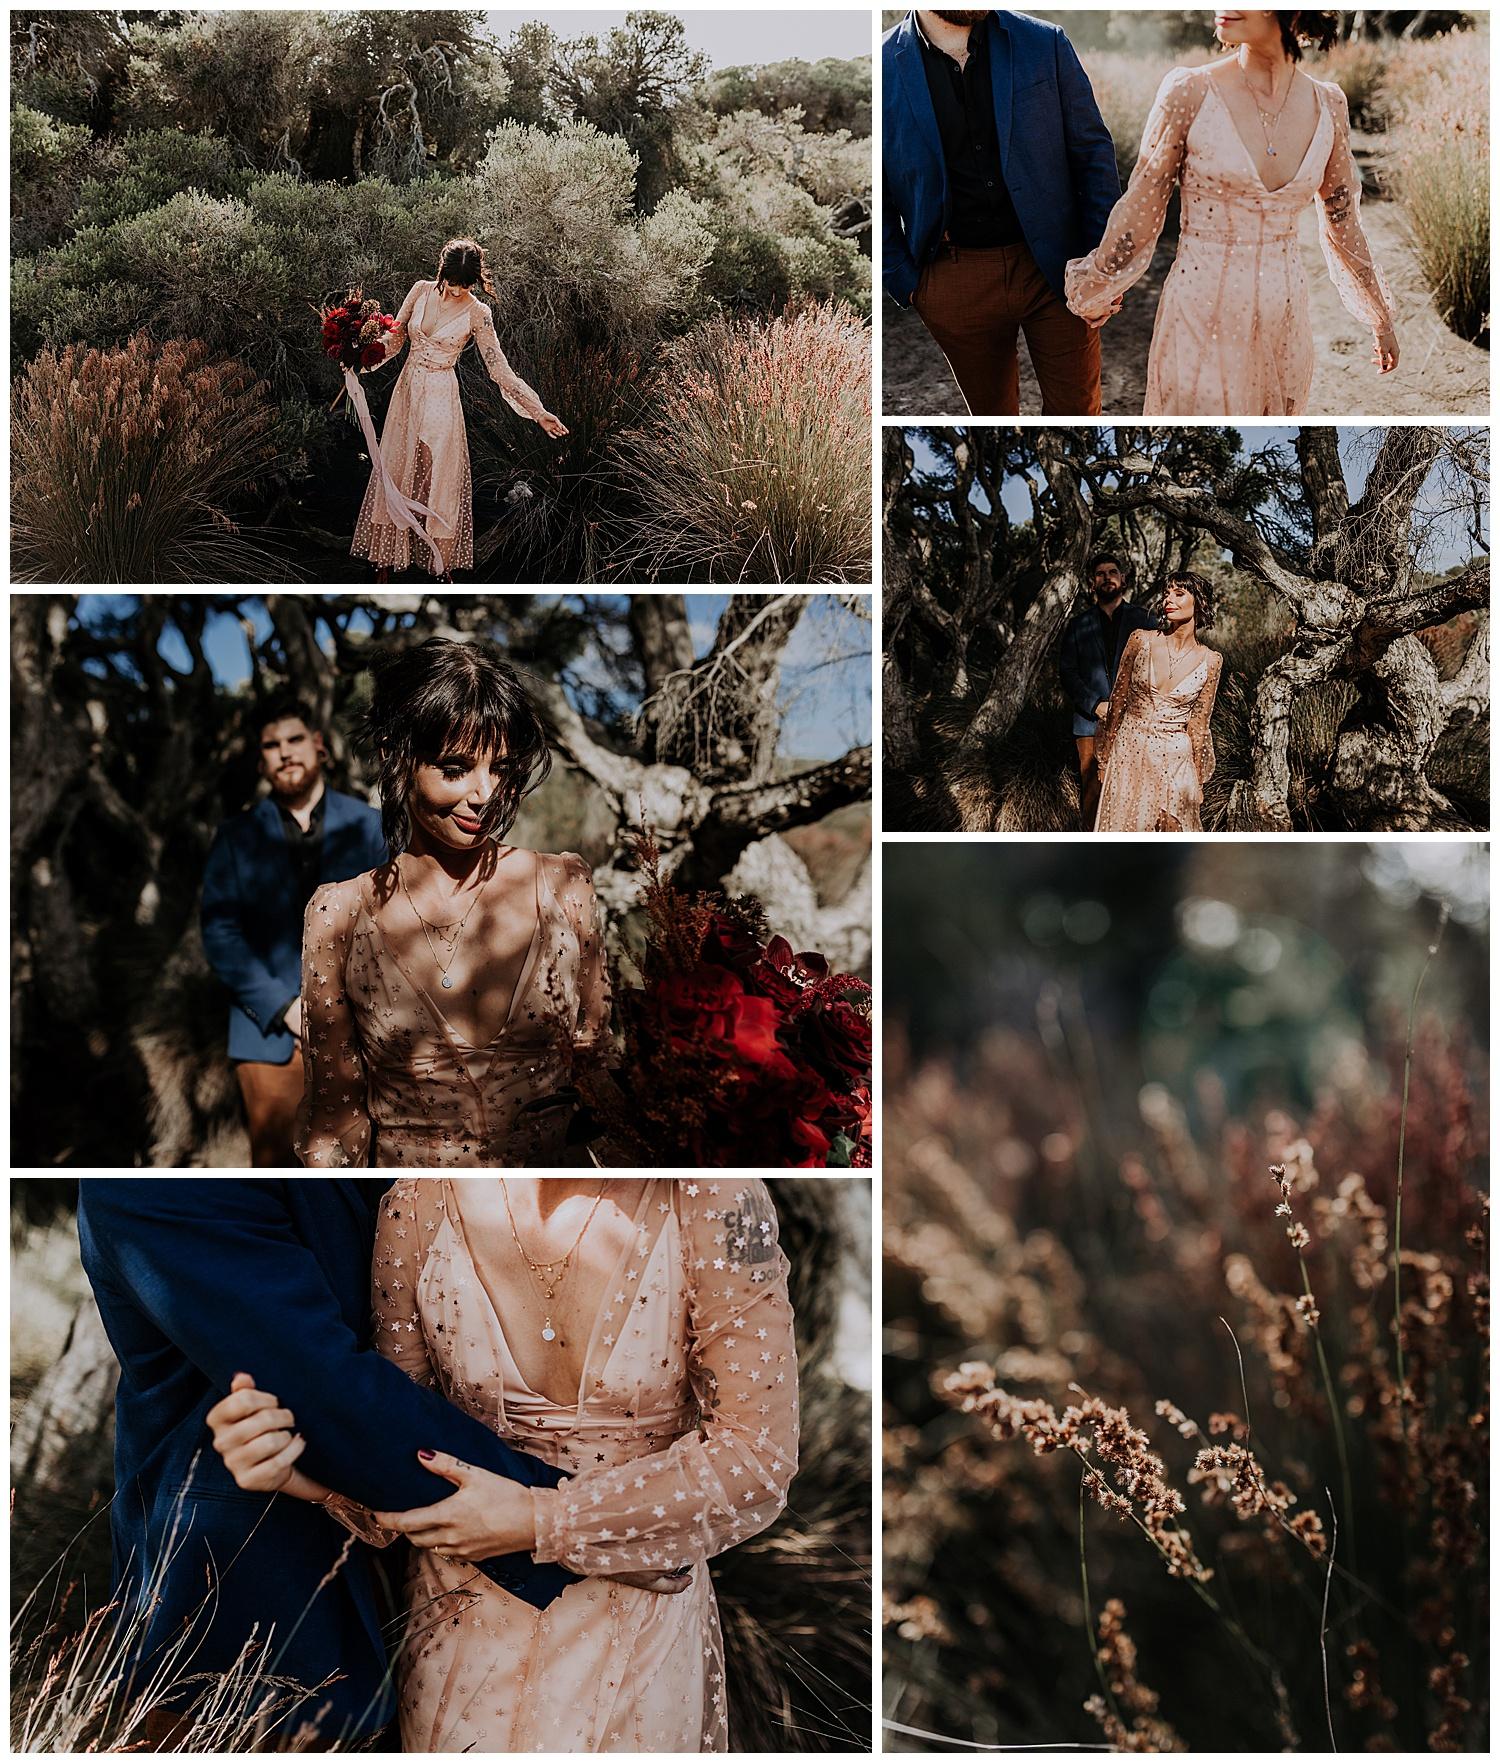 katie_jake_keeper_creative_wedding_photographer_16.JPG